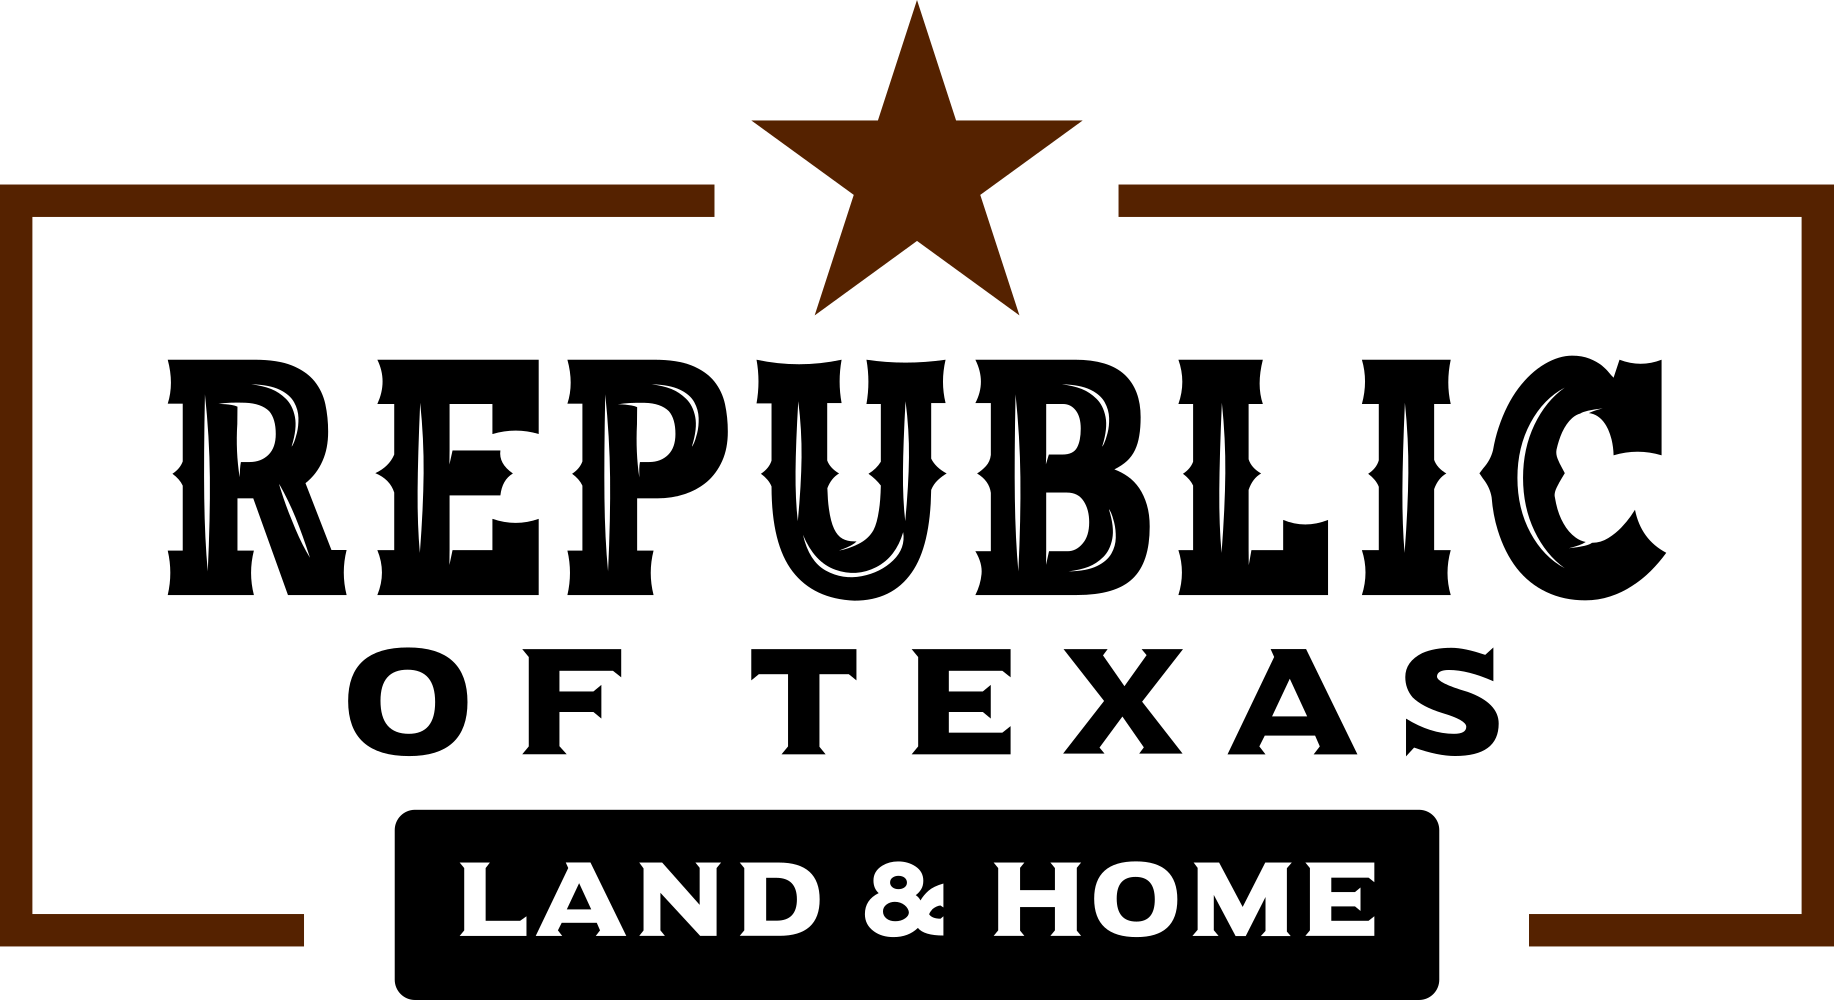 Republic of Texas Land & Home